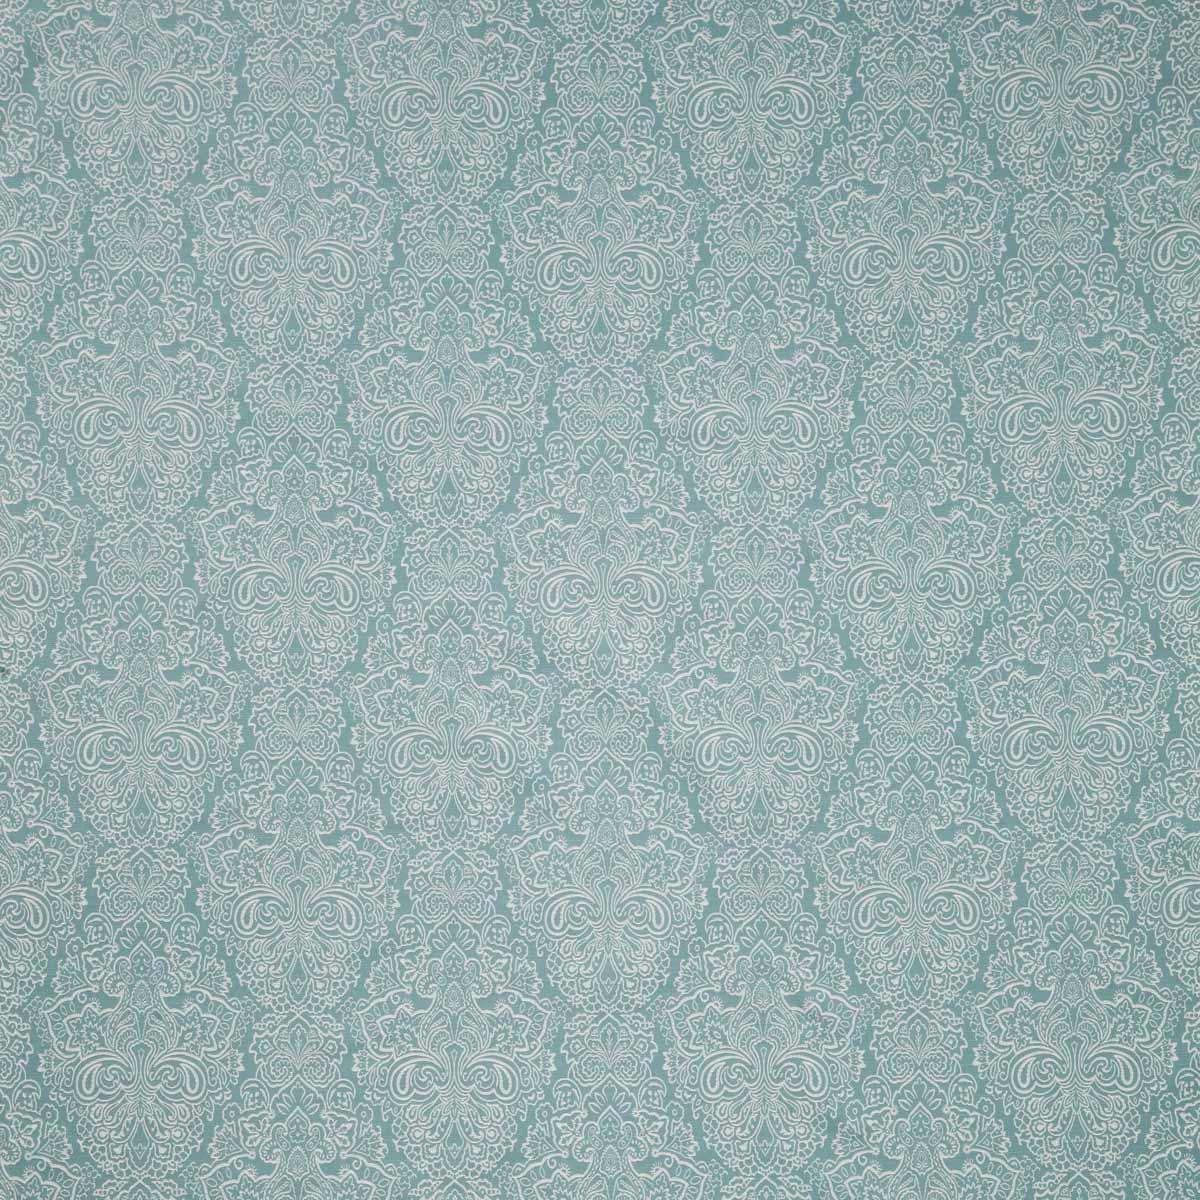 Wedgwood Renaissance Curtain Fabric